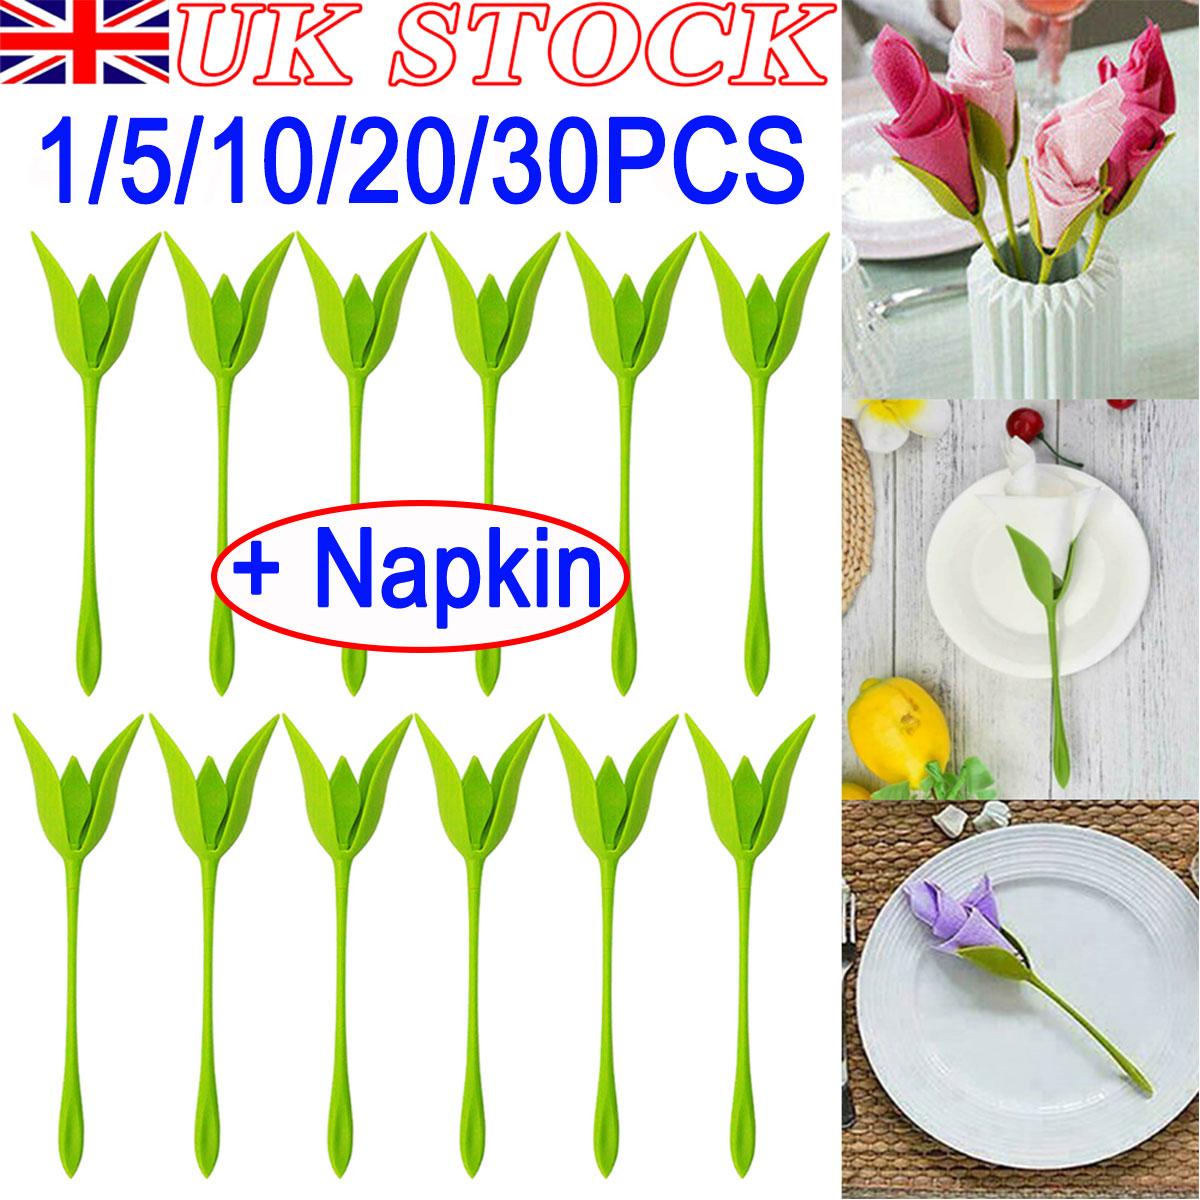 20 PCS Bloom Napkin Holders Table Plastic Twist Flower Serviette Holder Green